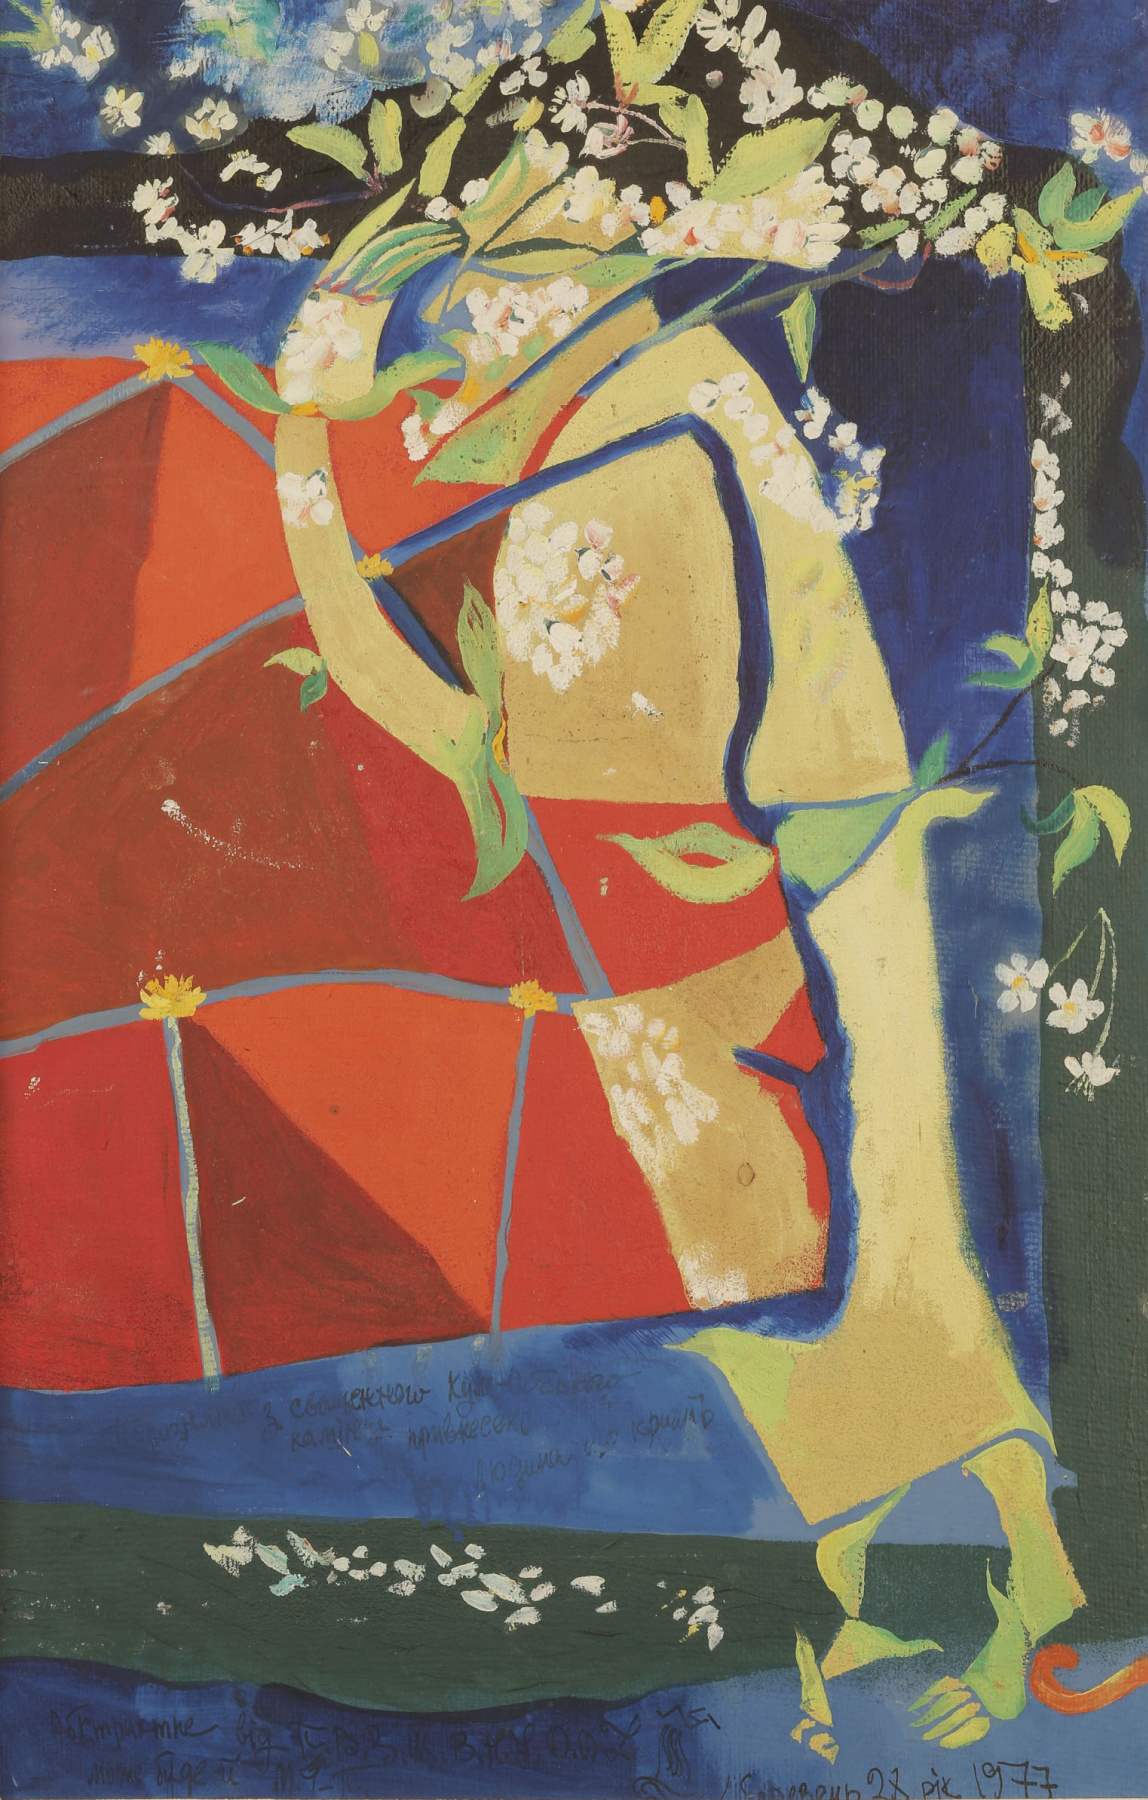 Nikolai Ivanovich Tregub. Abstract